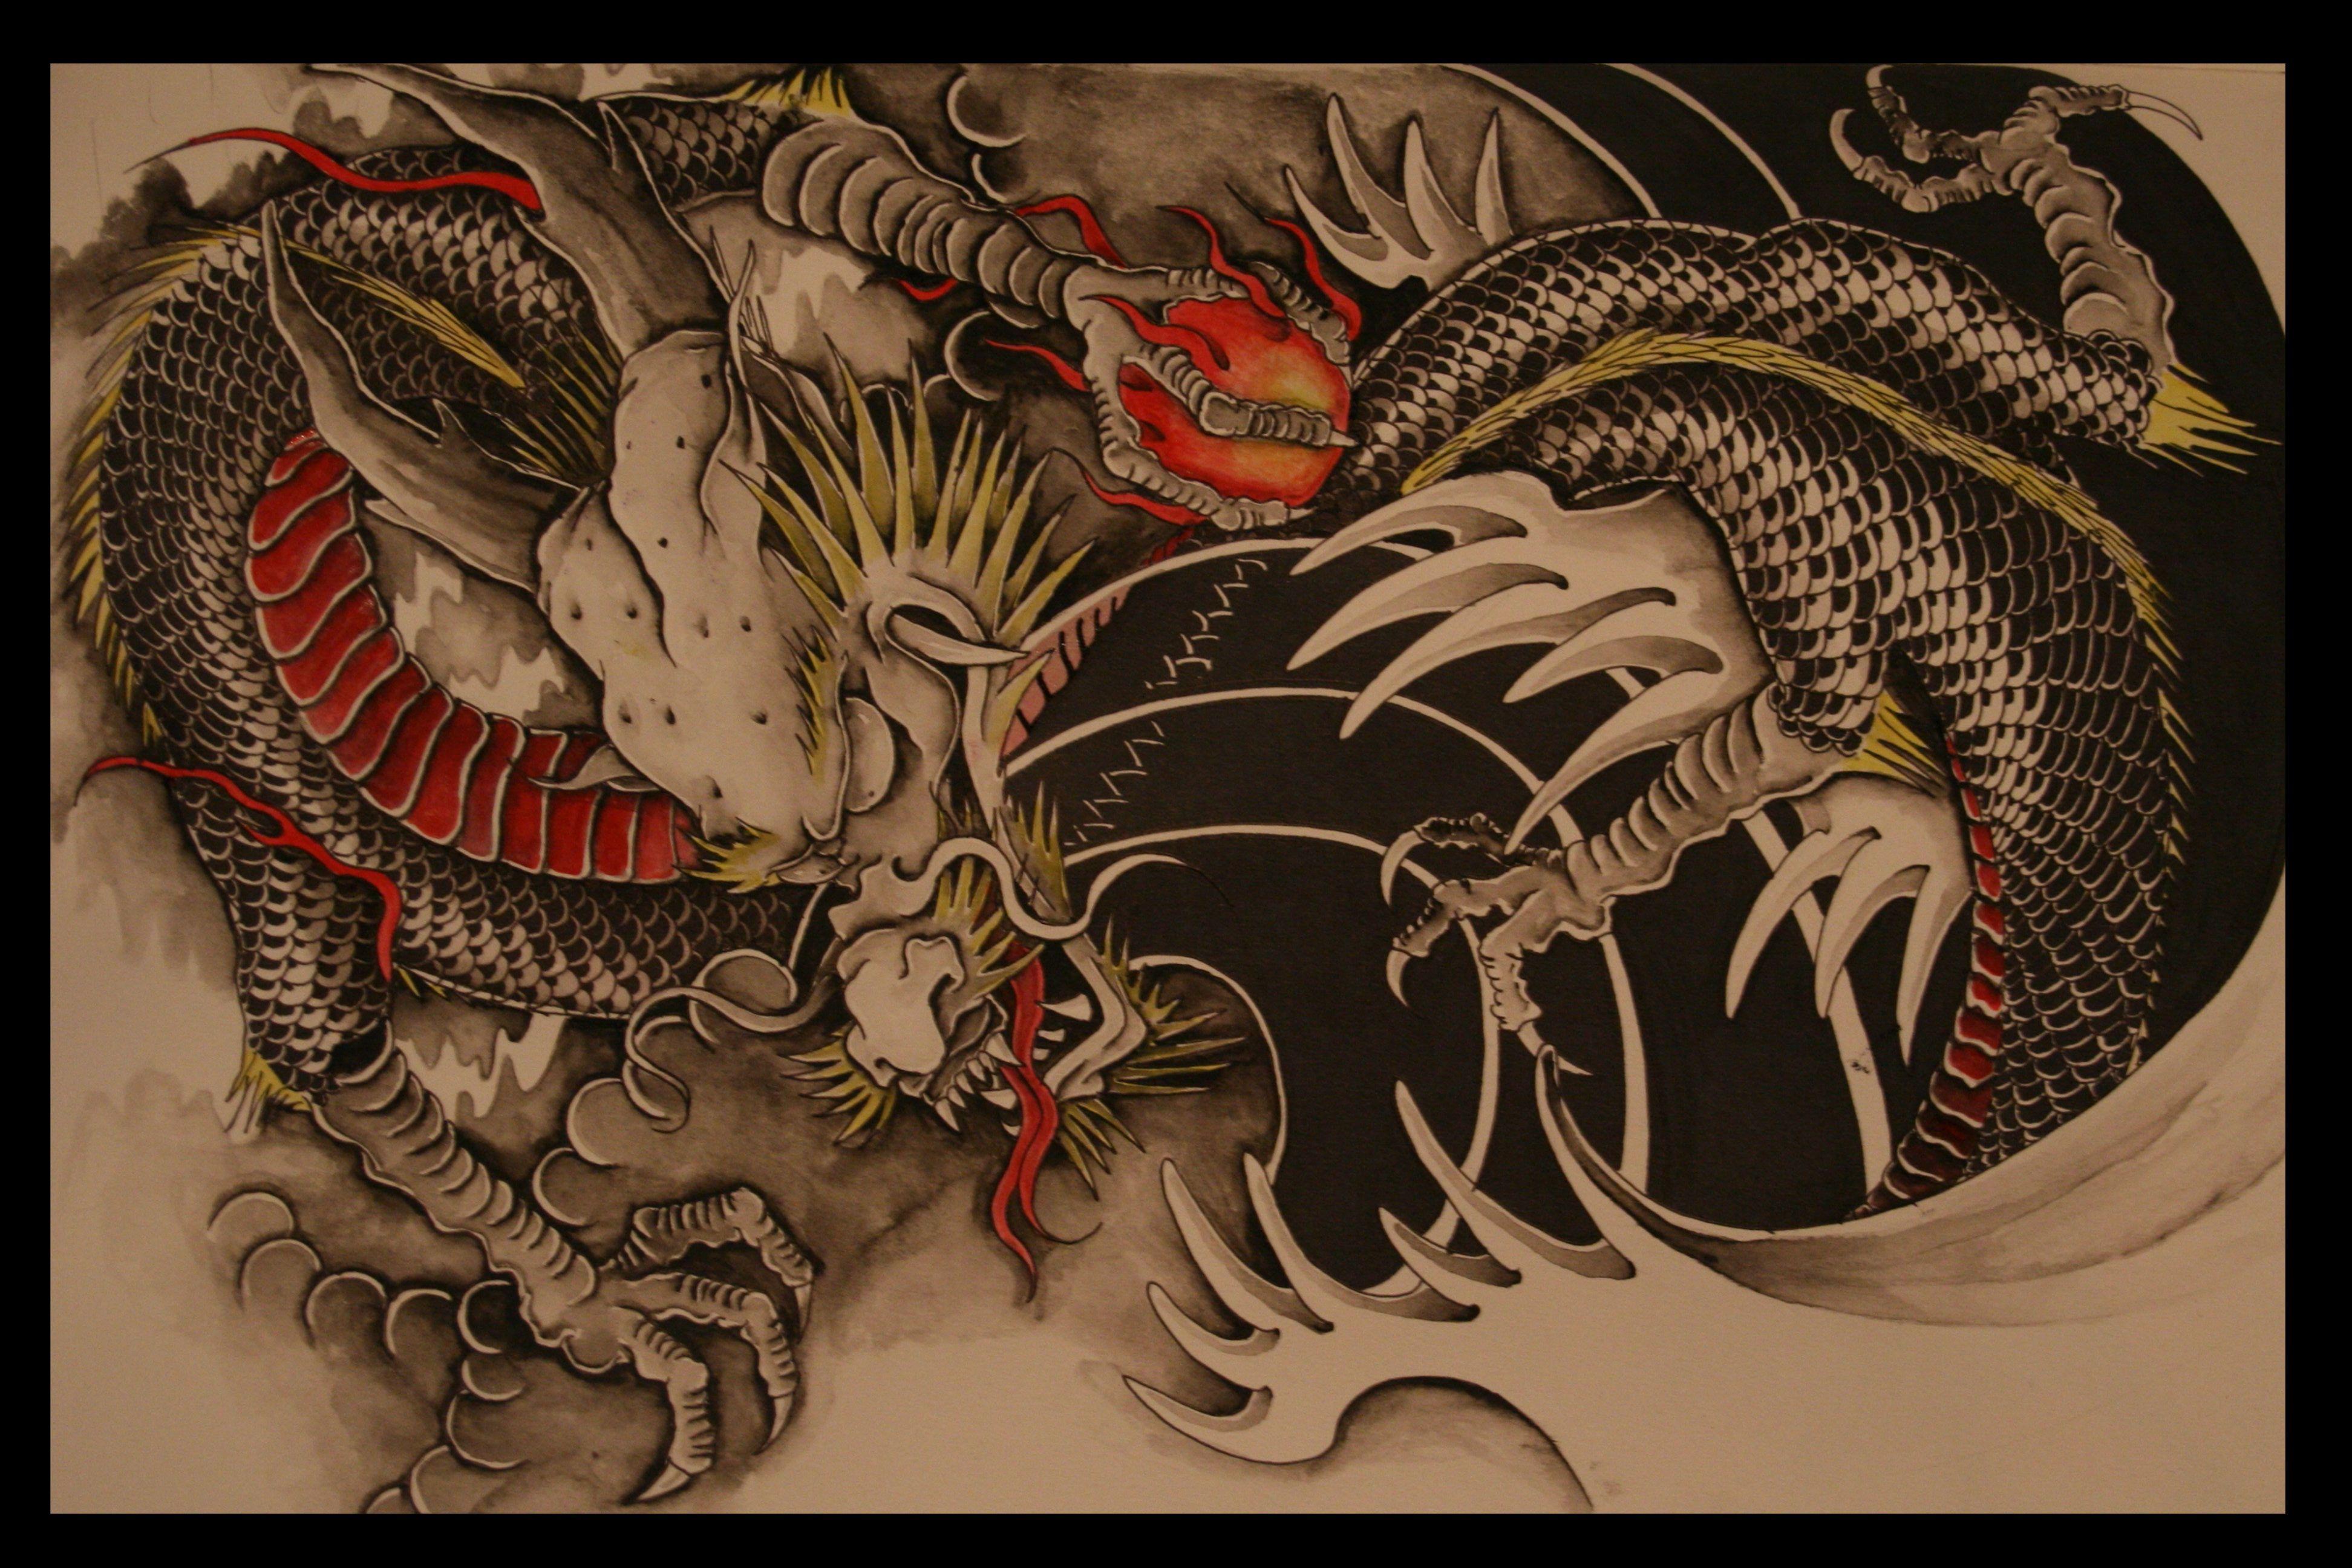 Pin By Jerolyn Crute On Tattoo Designs Earth Dragon Chinese Zodiac Dragon Tattoo Designs Dragon Tattoo